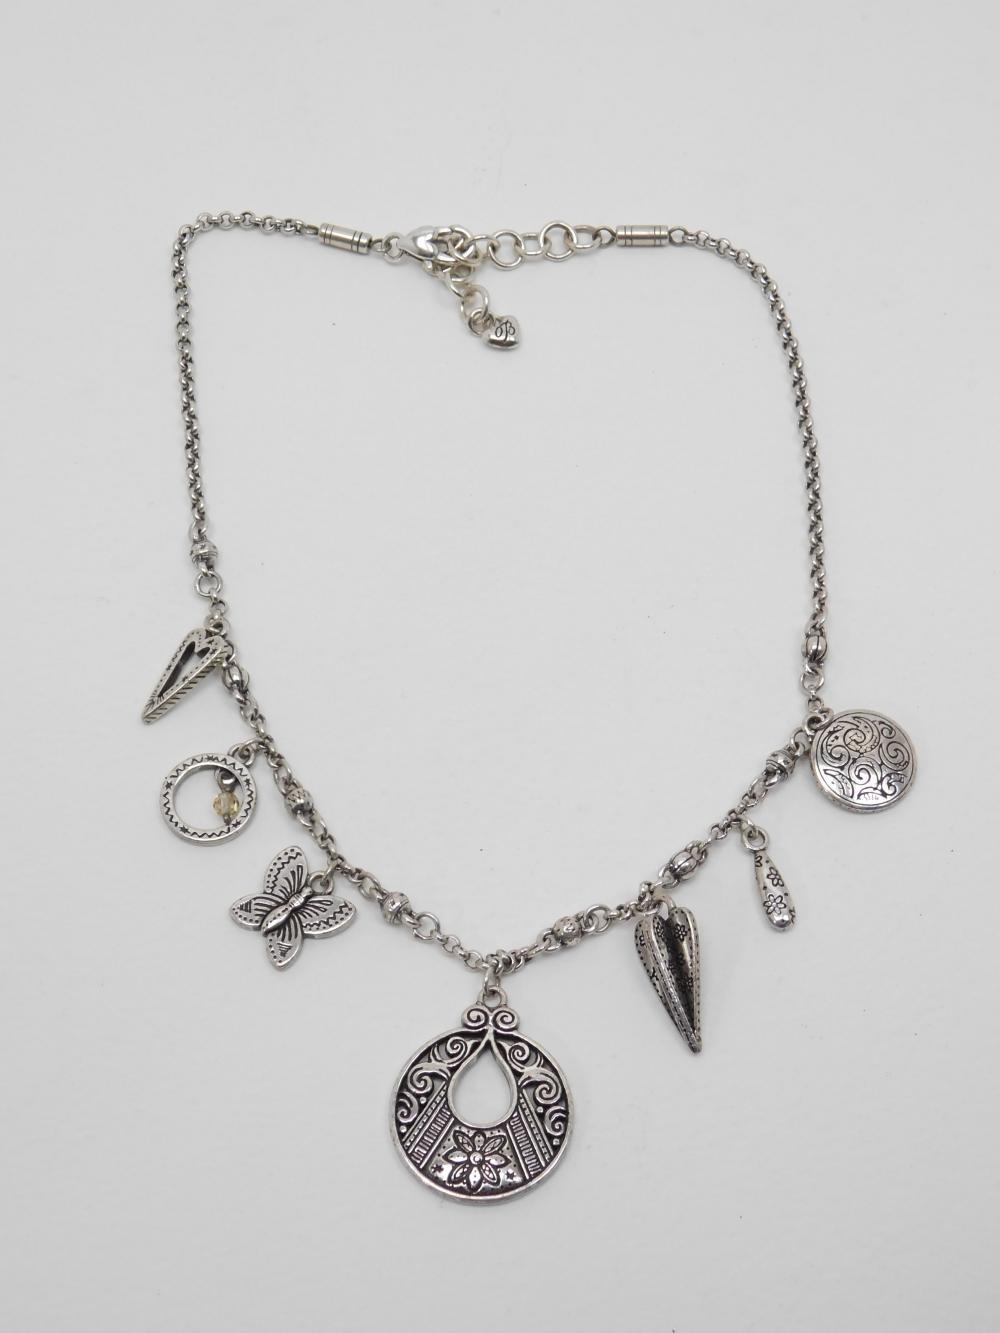 Brighton Costume Jewelry Charm Necklace